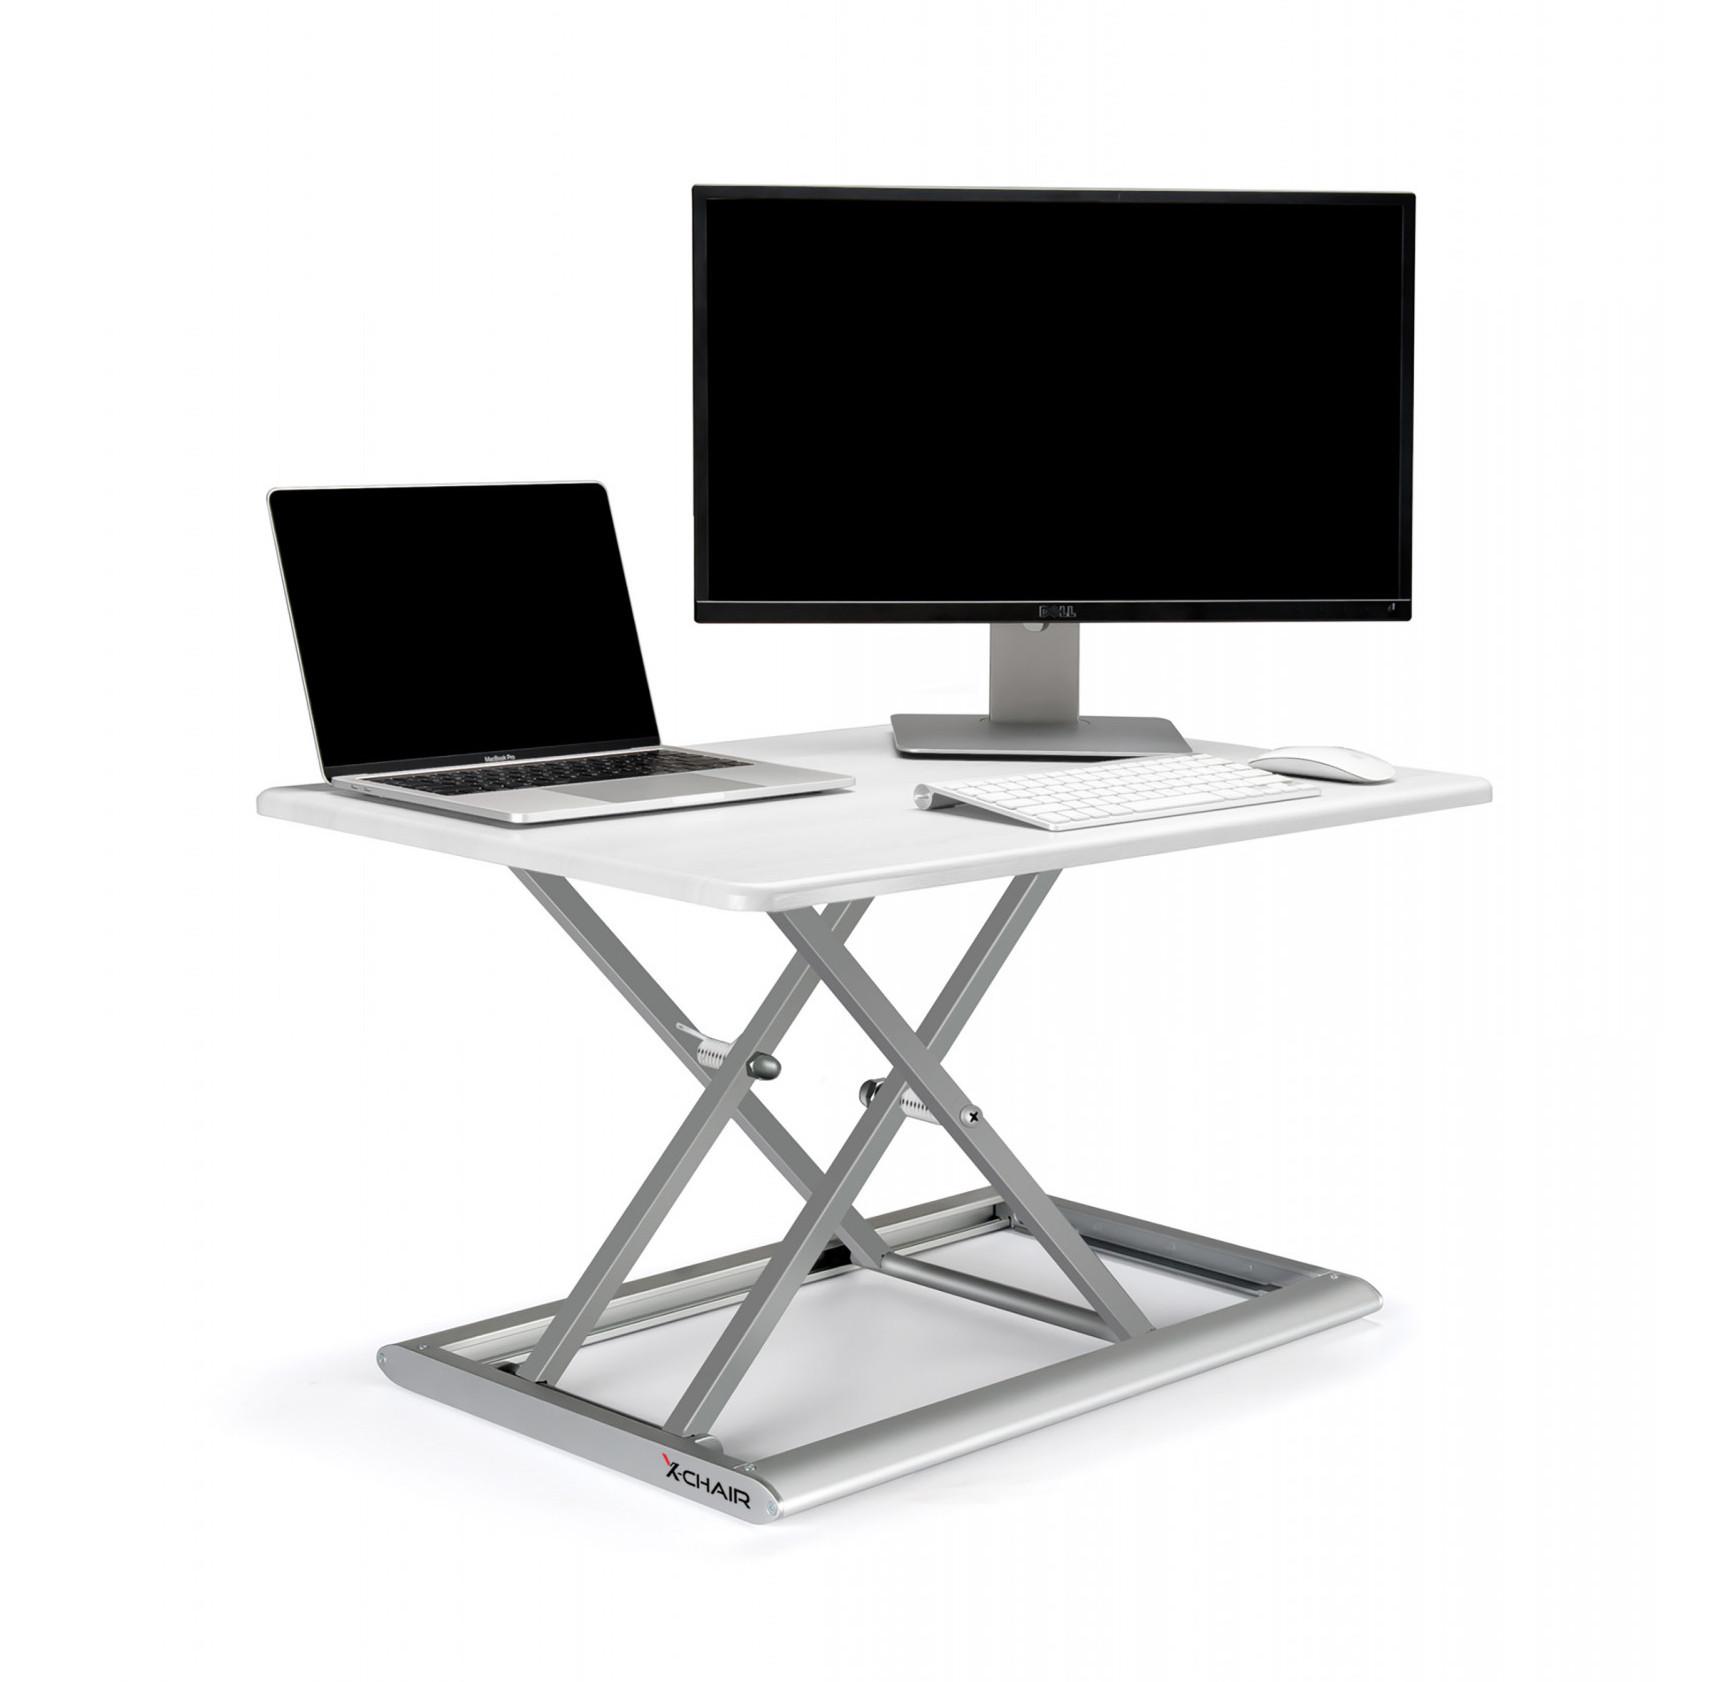 x-chair x-flextop